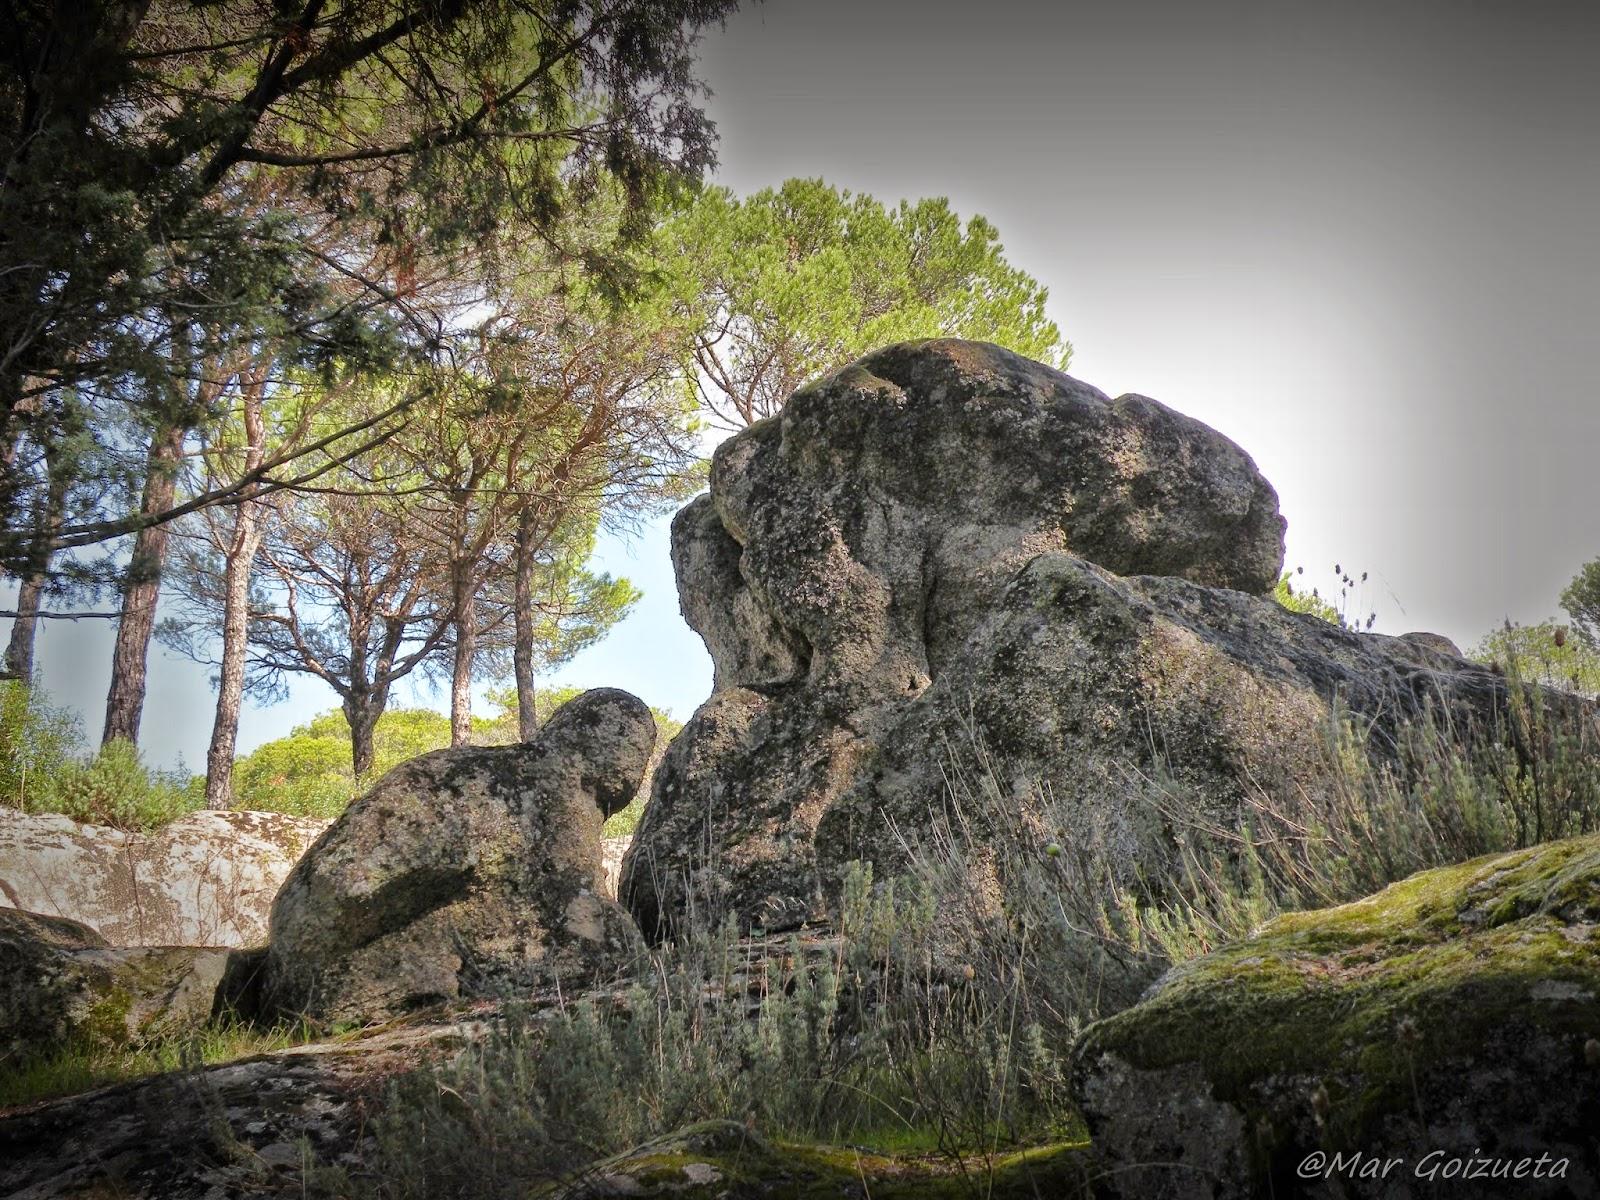 El Arrodillado de piedra. Foto Mar Goizueta